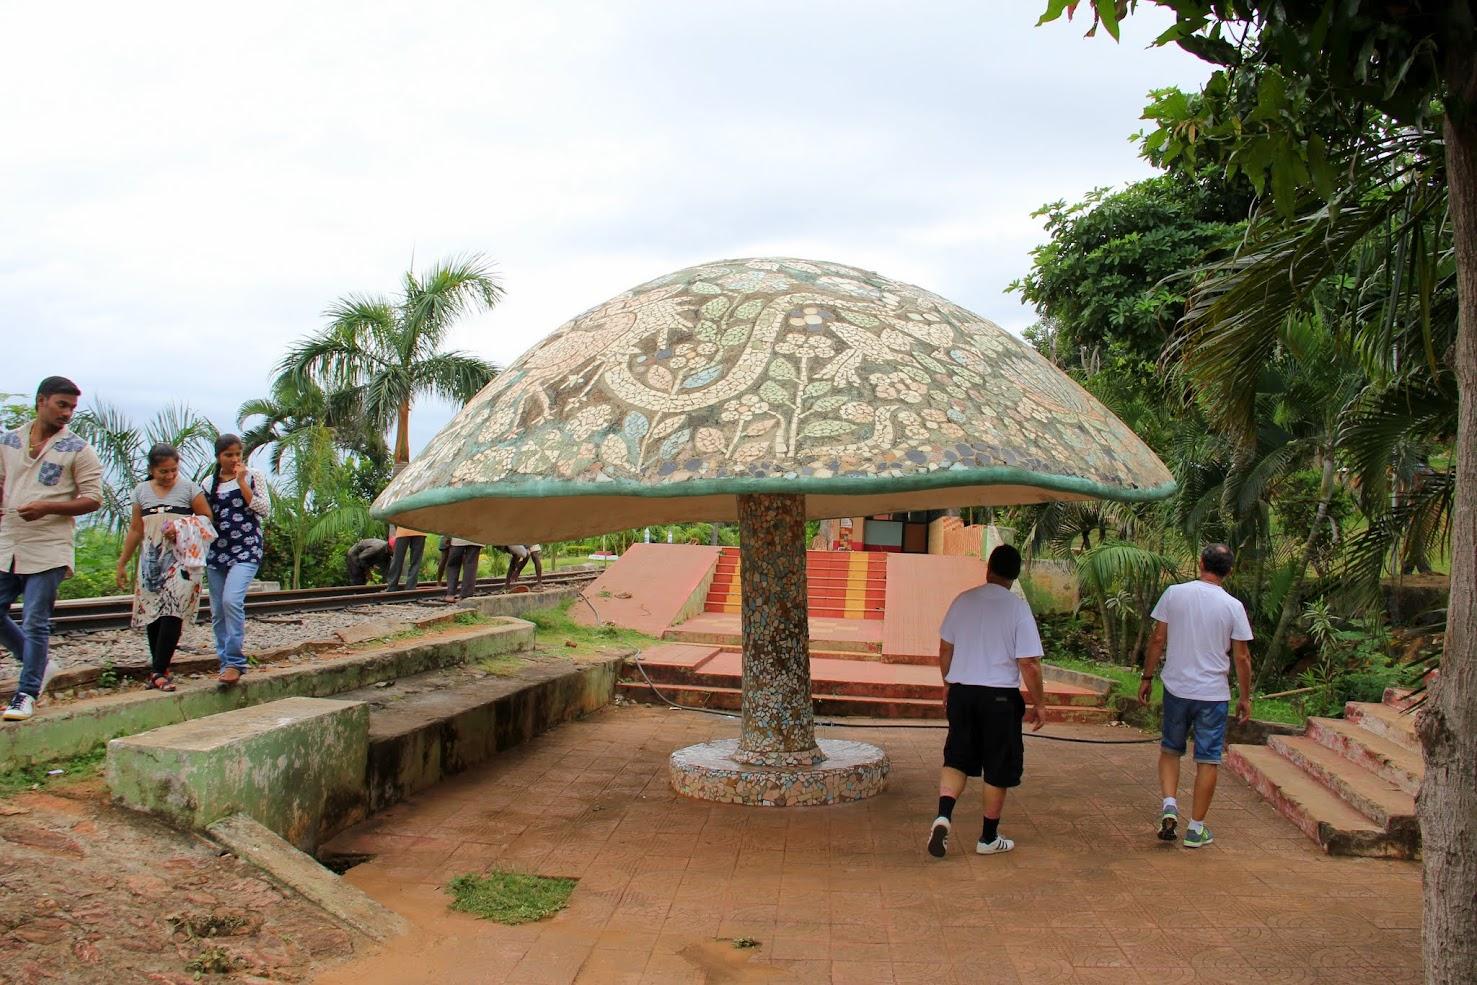 Zadarmo dátumové údaje lokalít v Visakhapatnam